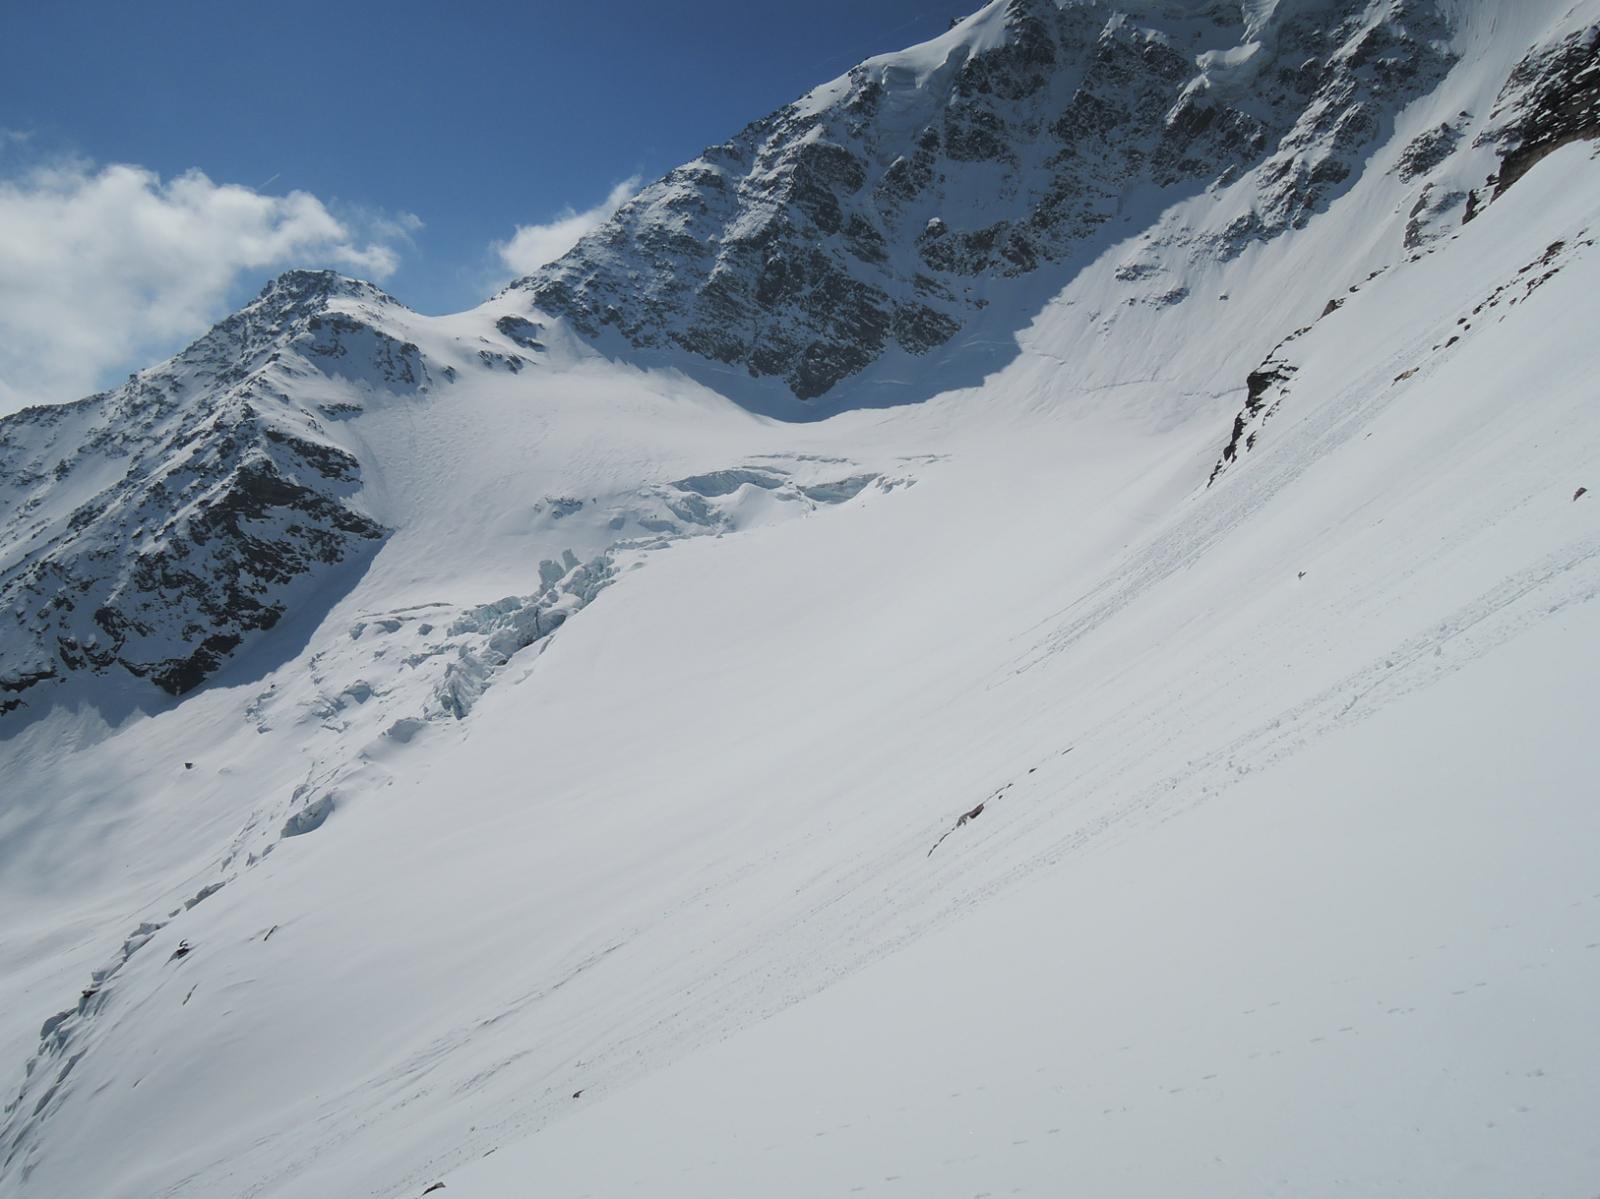 Rossbode gletscher e quota 3332 sulla Breitloibgrat